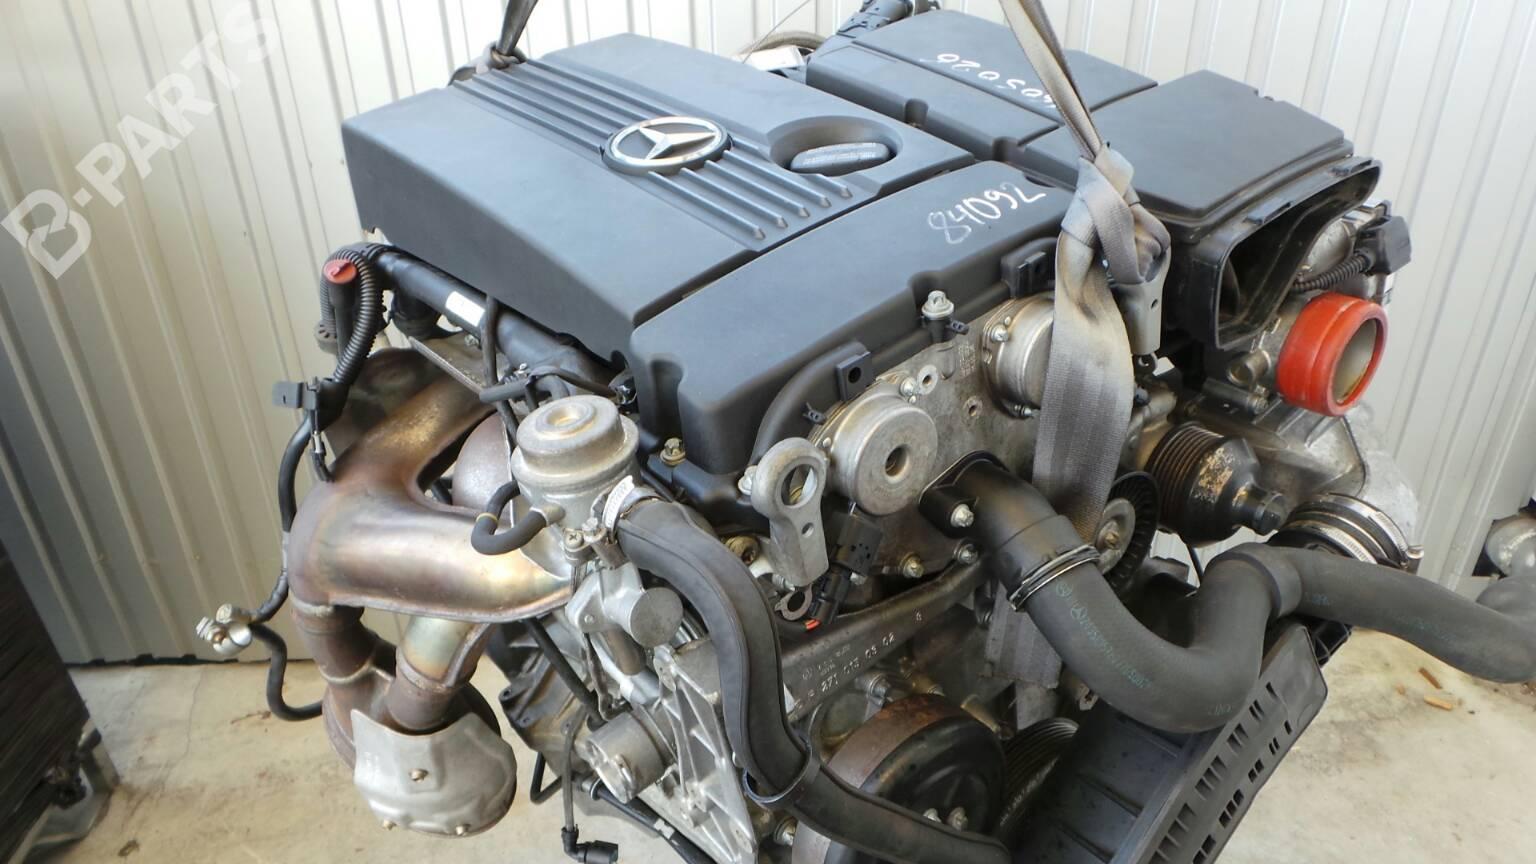 Engine mercedes benz c class w203 c 180 kompressor 203 for Mercedes benz c class engine